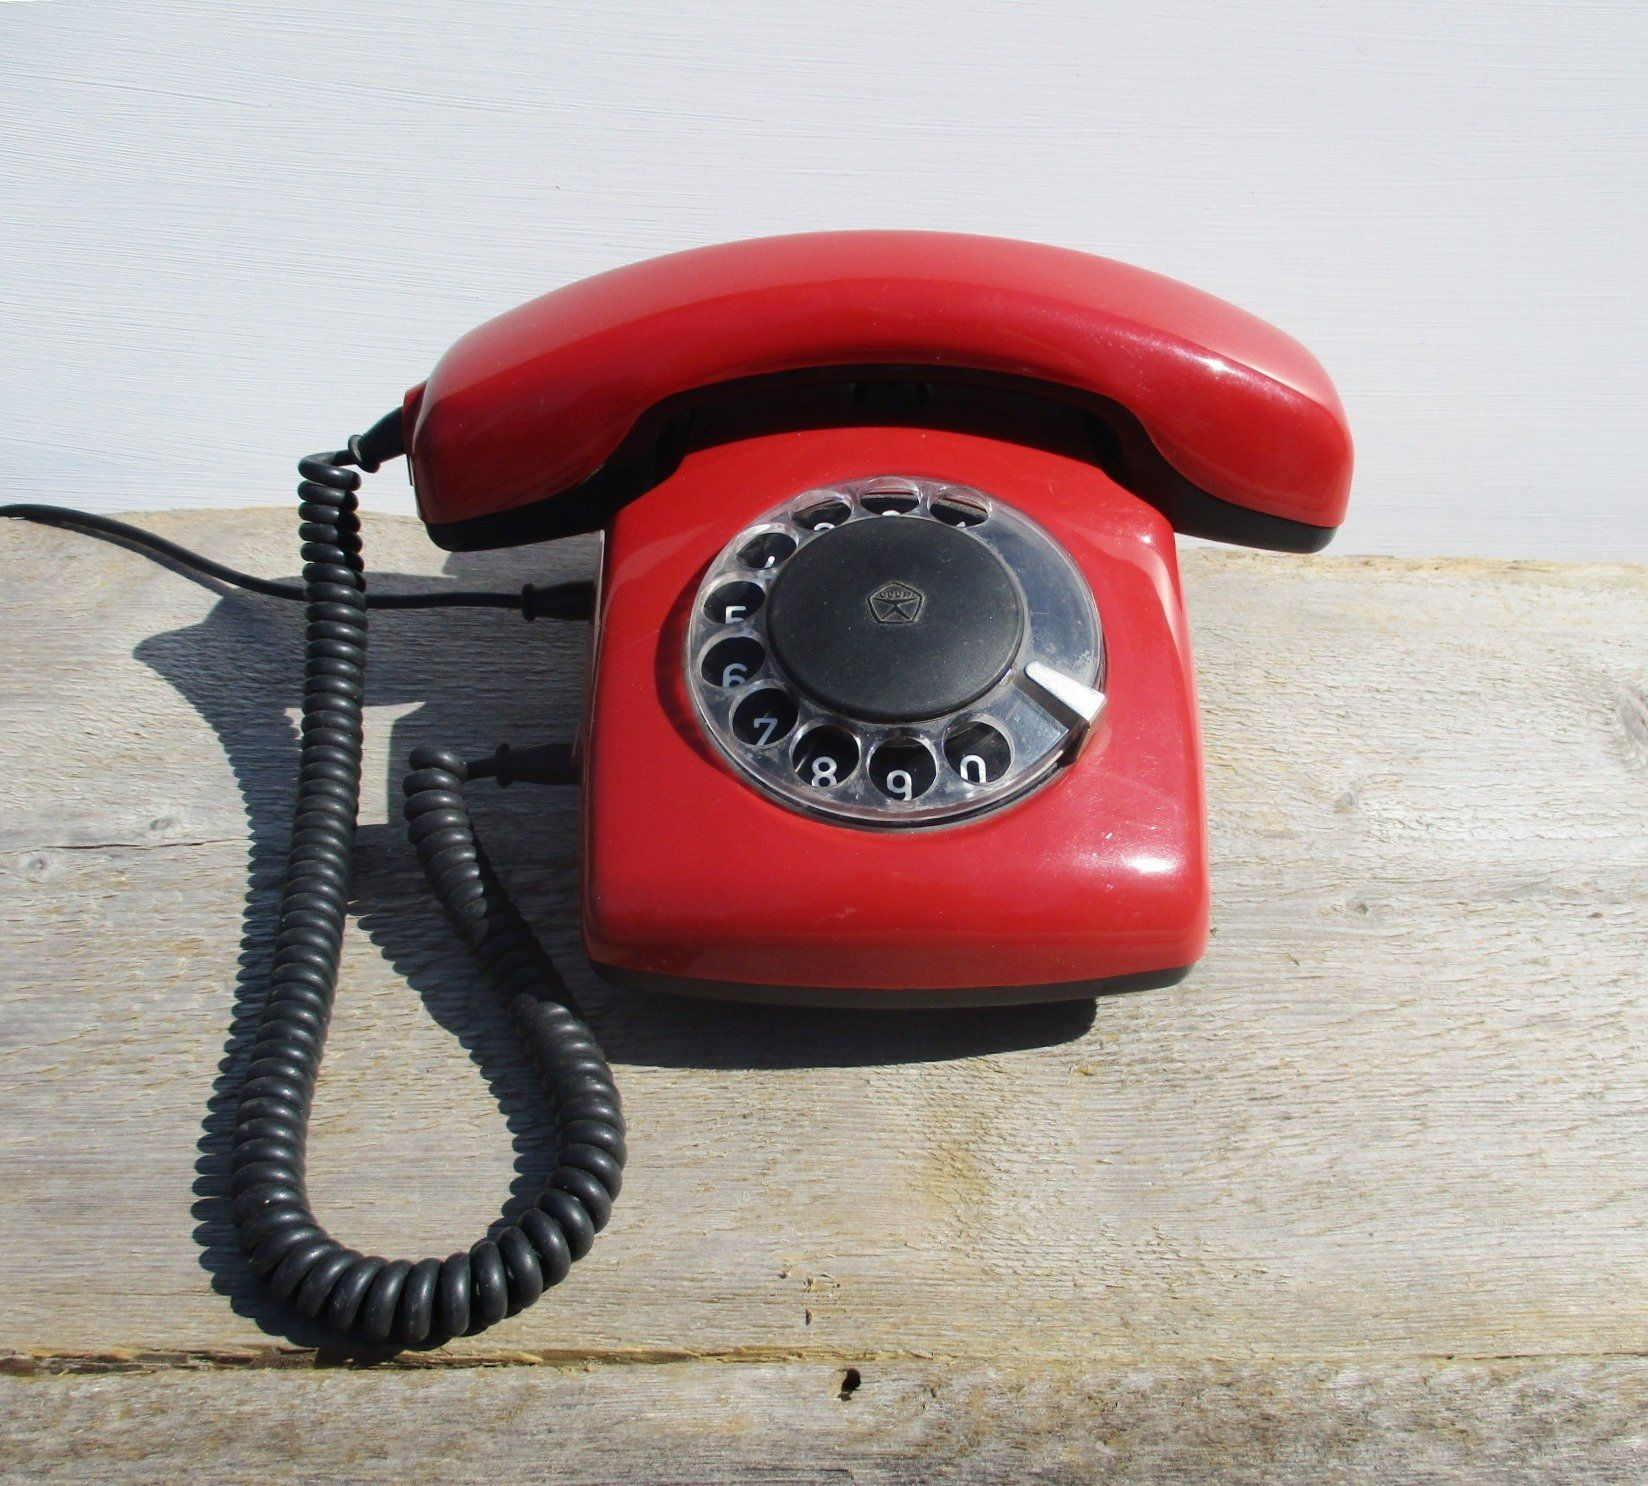 Red phone Red rotary telephone Soviet vintage phone Russian phone Table phone Retro telephone Red retro home decor Working rotary phone